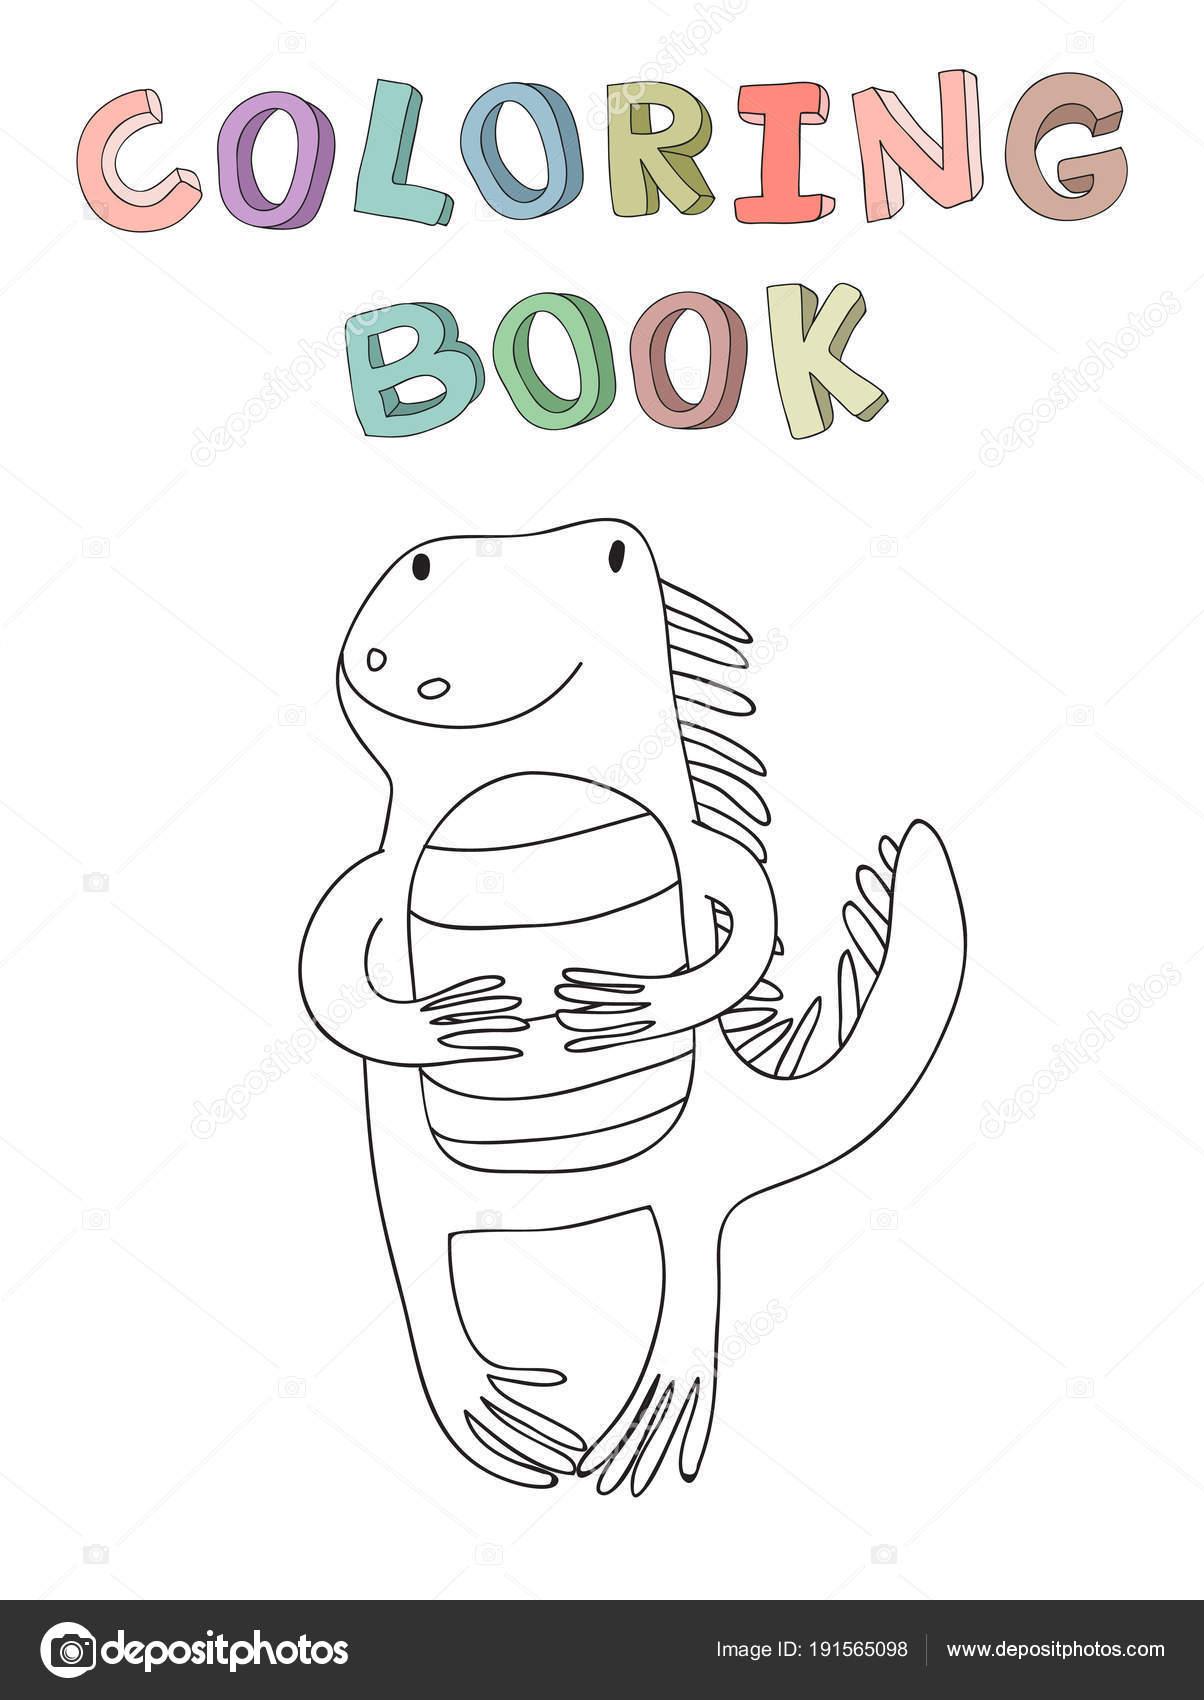 Imágenes Iguana Animada Facil Personaje De Dibujos Animados Lindo